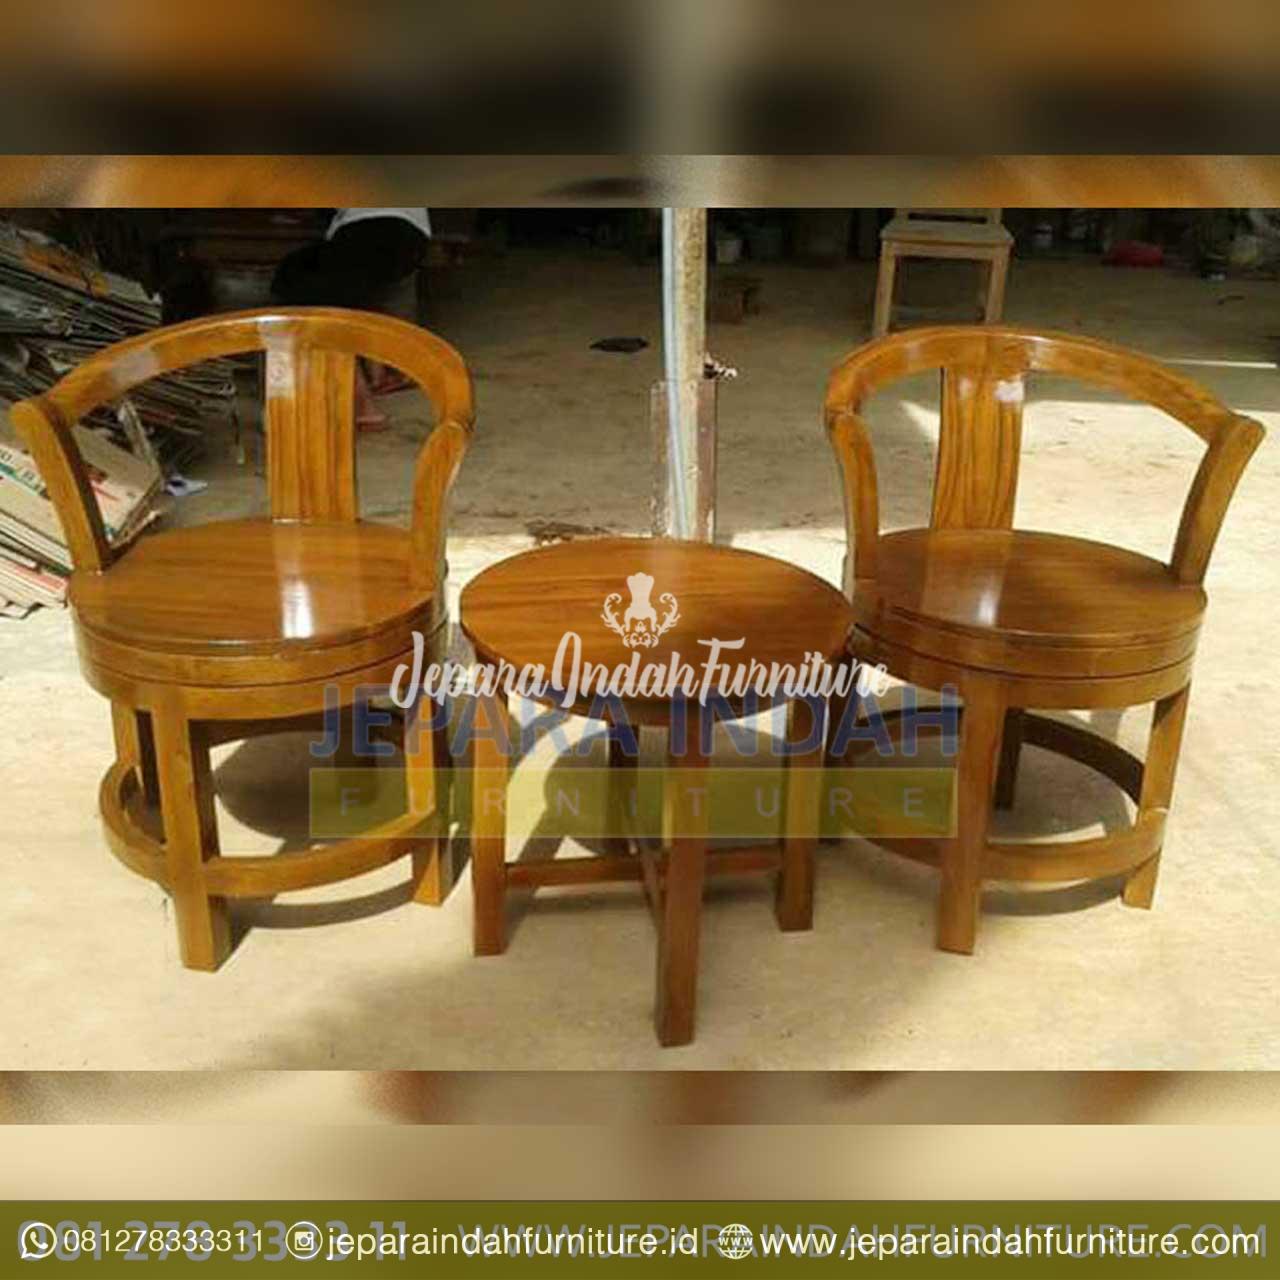 Kursi Teras Kayu Jati Minimalis Harga Murah By Jepara Indah Furniture